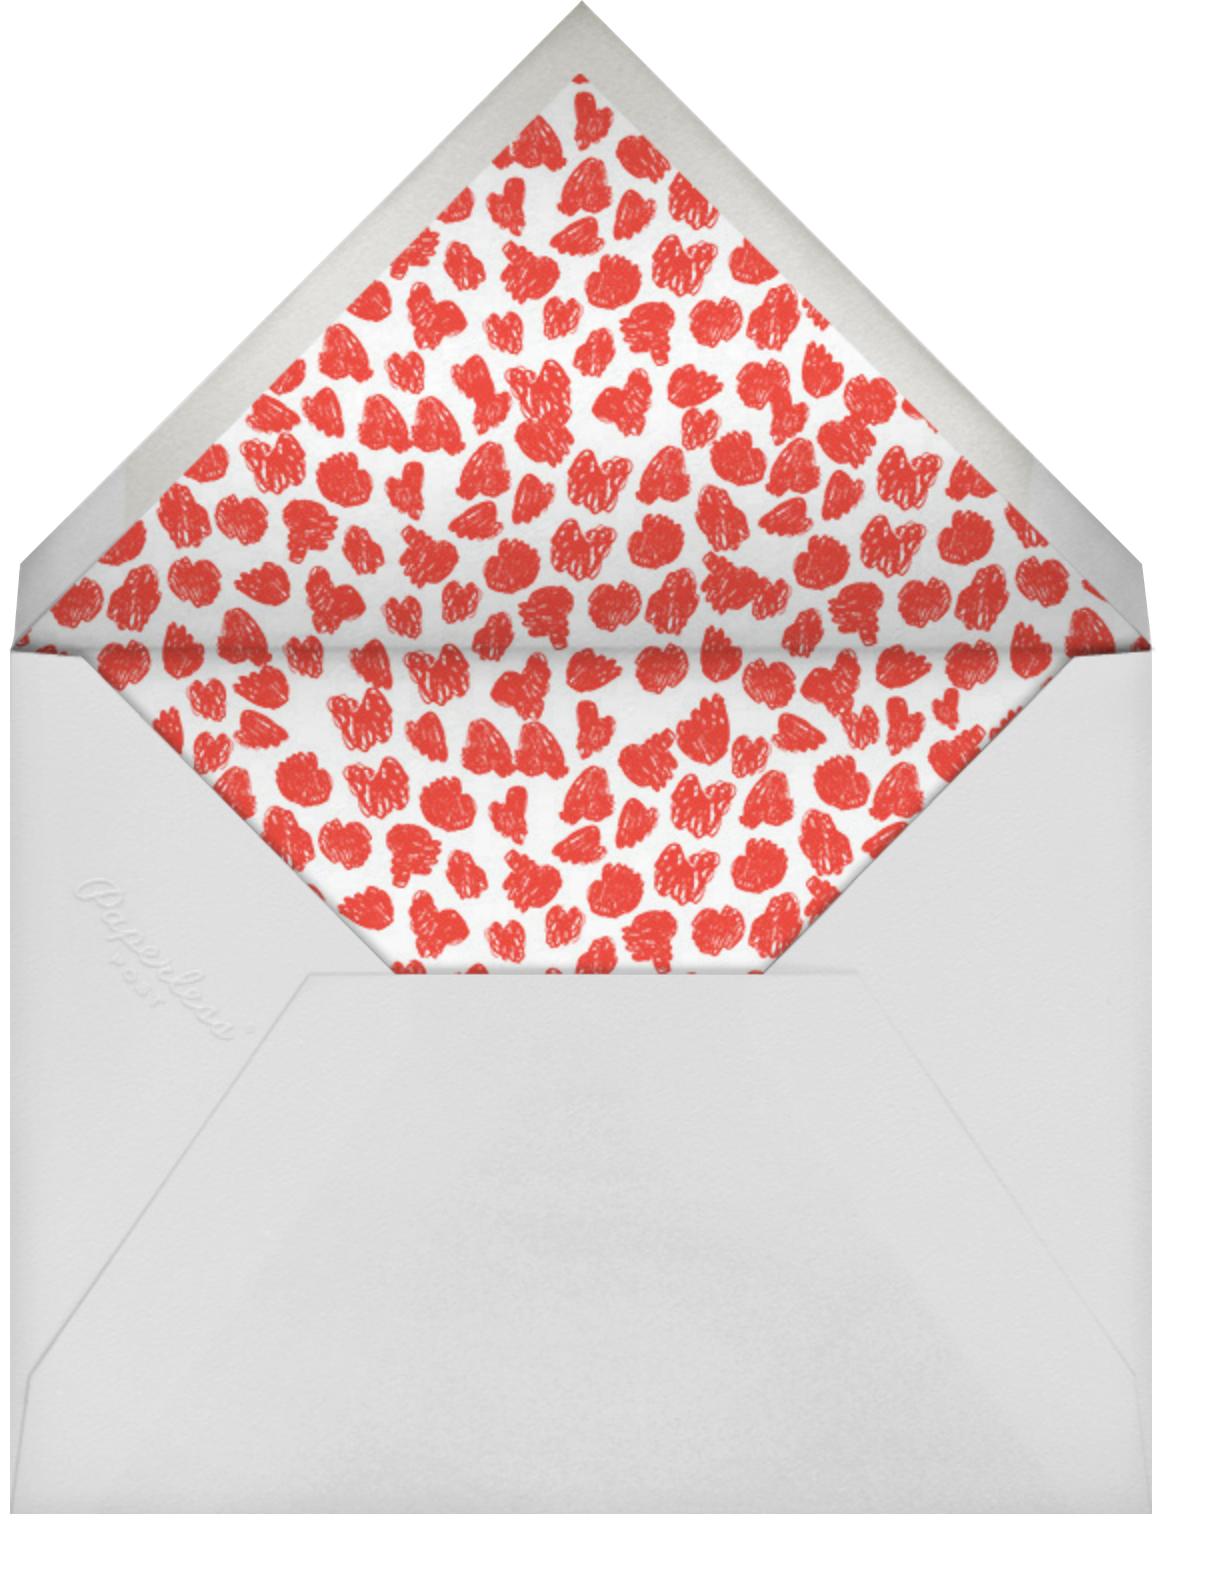 Tomatoes Love Tomatoes - Mr. Boddington's Studio - Mother's Day - envelope back